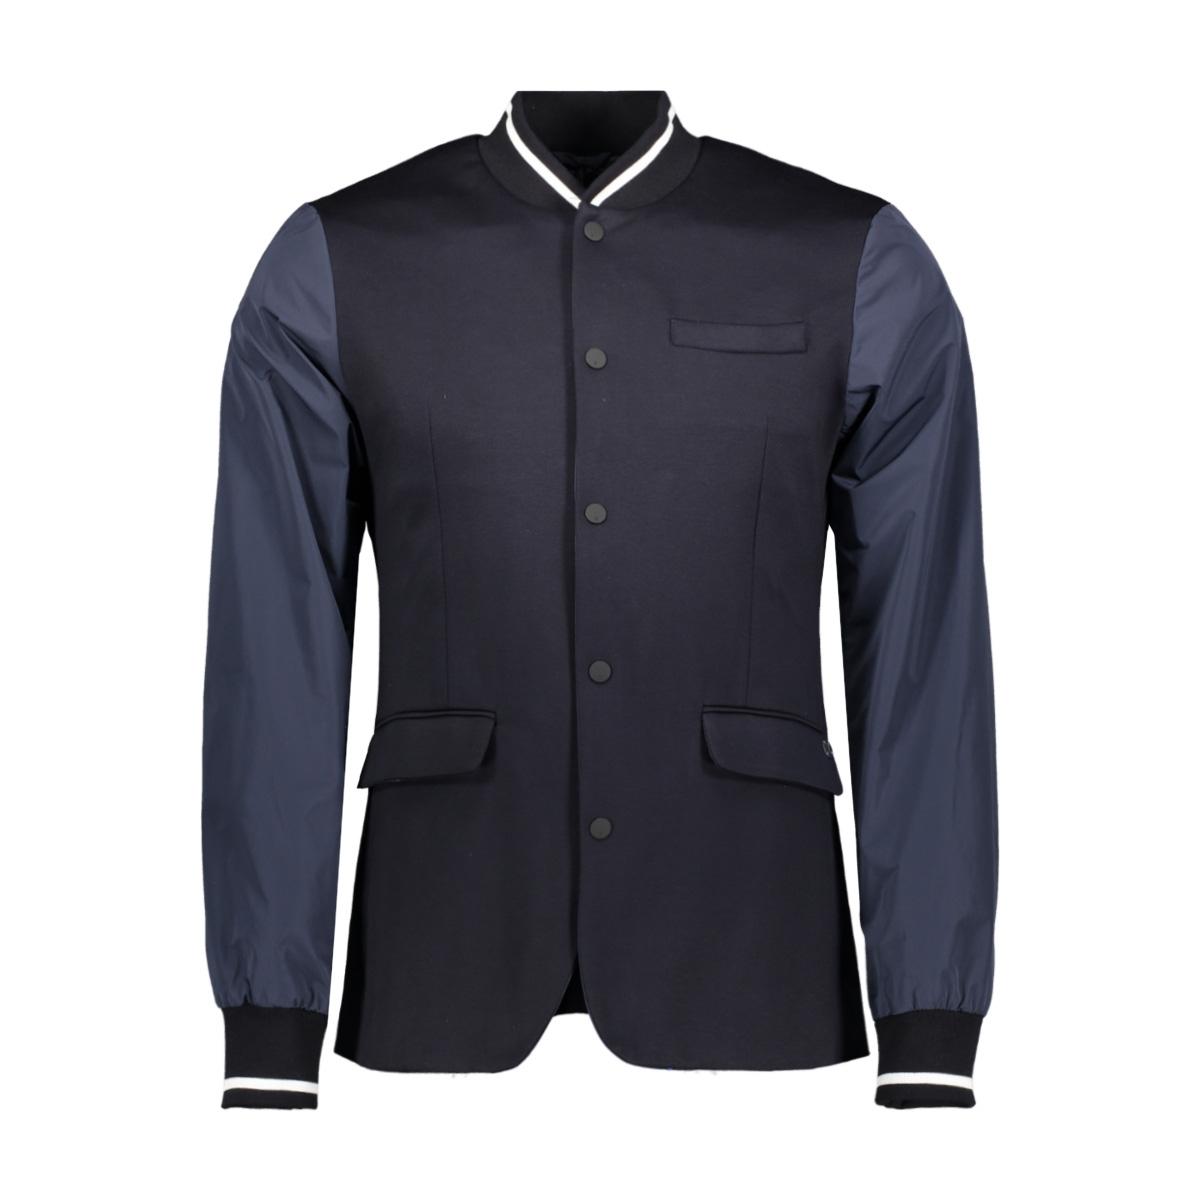 all season jacket 1901 1303 m 1 twinlife colbert 6800 eclipse